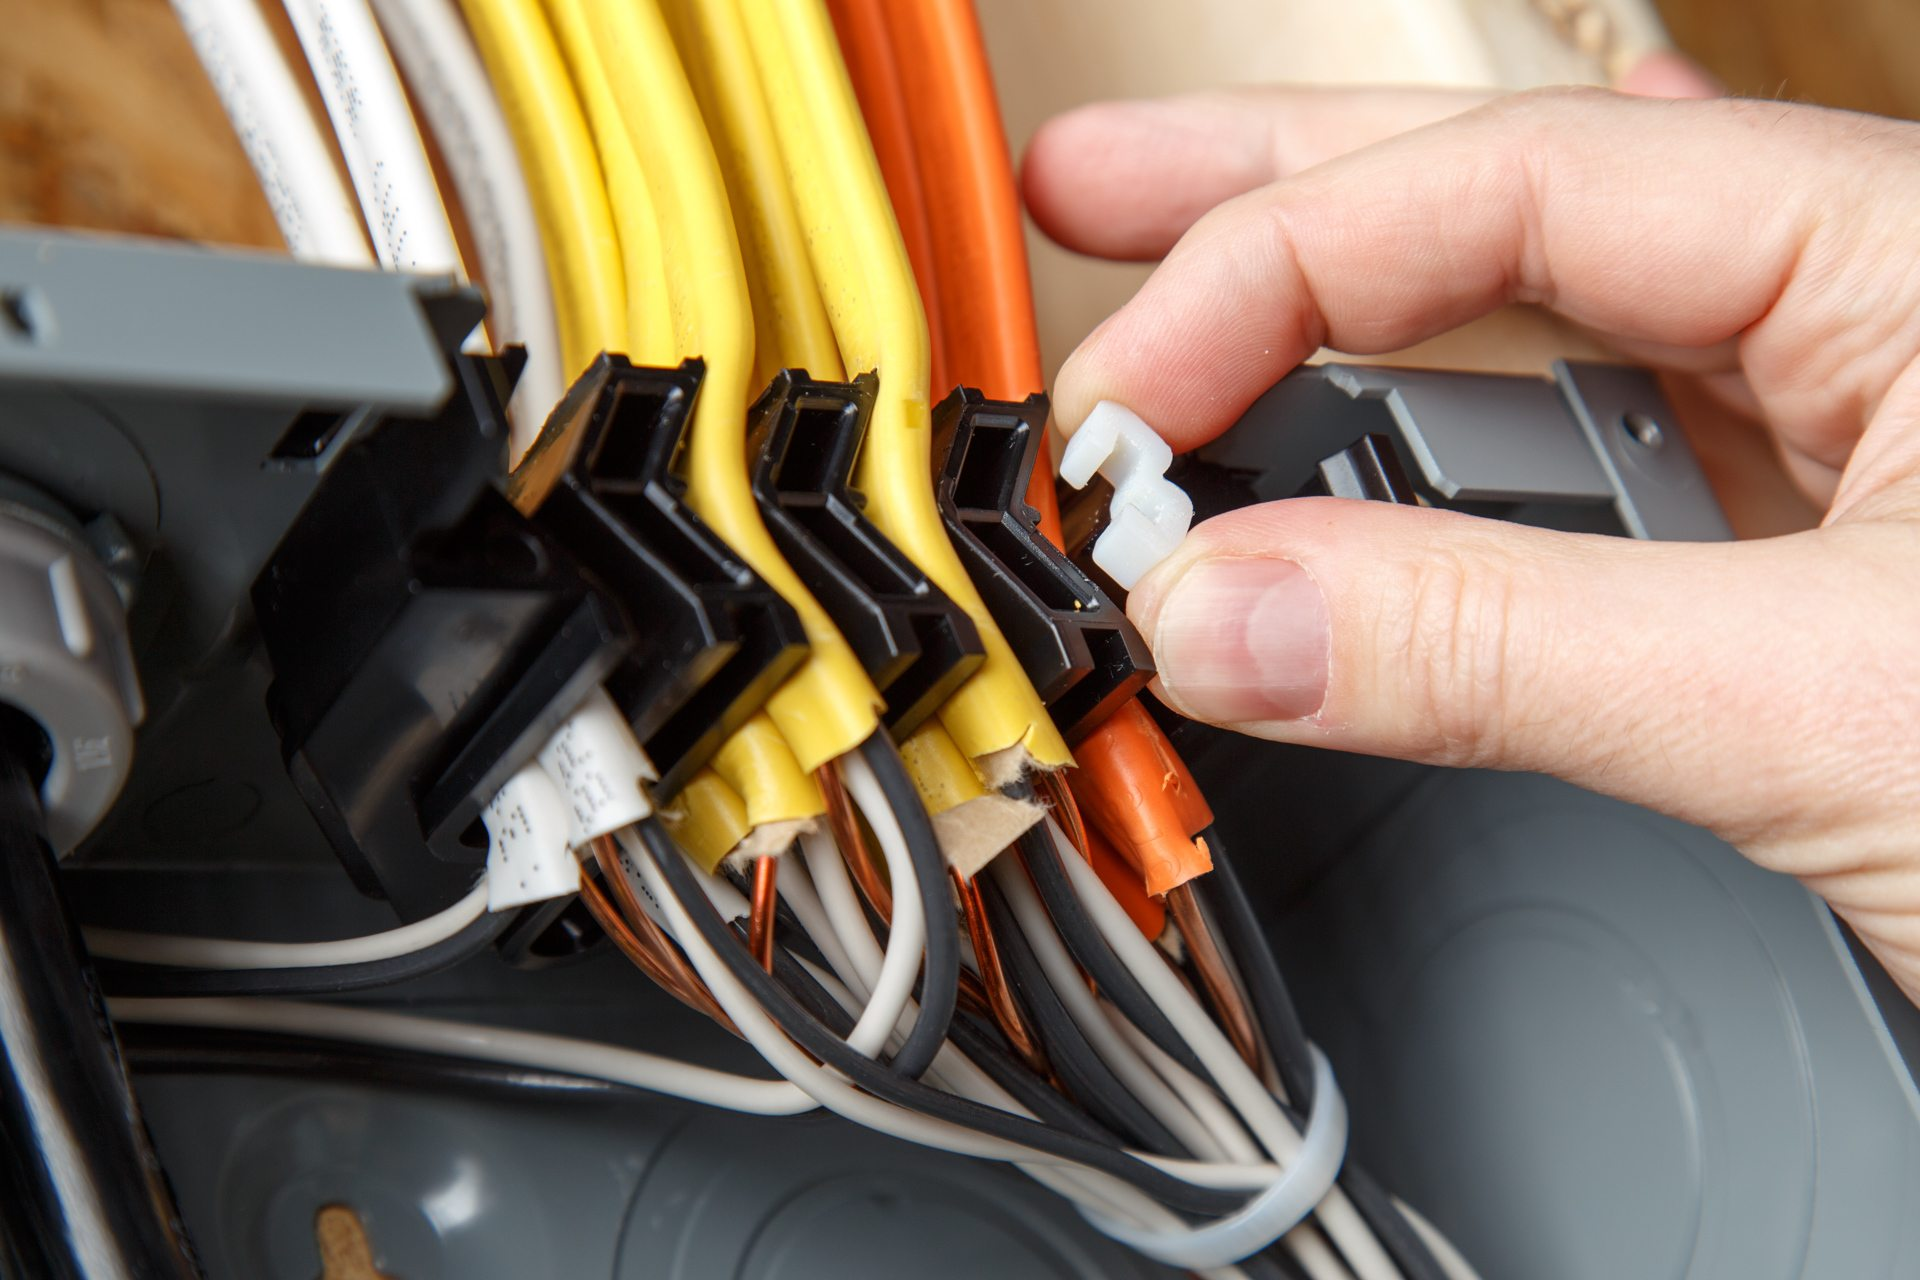 Qwik-Grip™ speeds up wire installation, simplifies rough-in